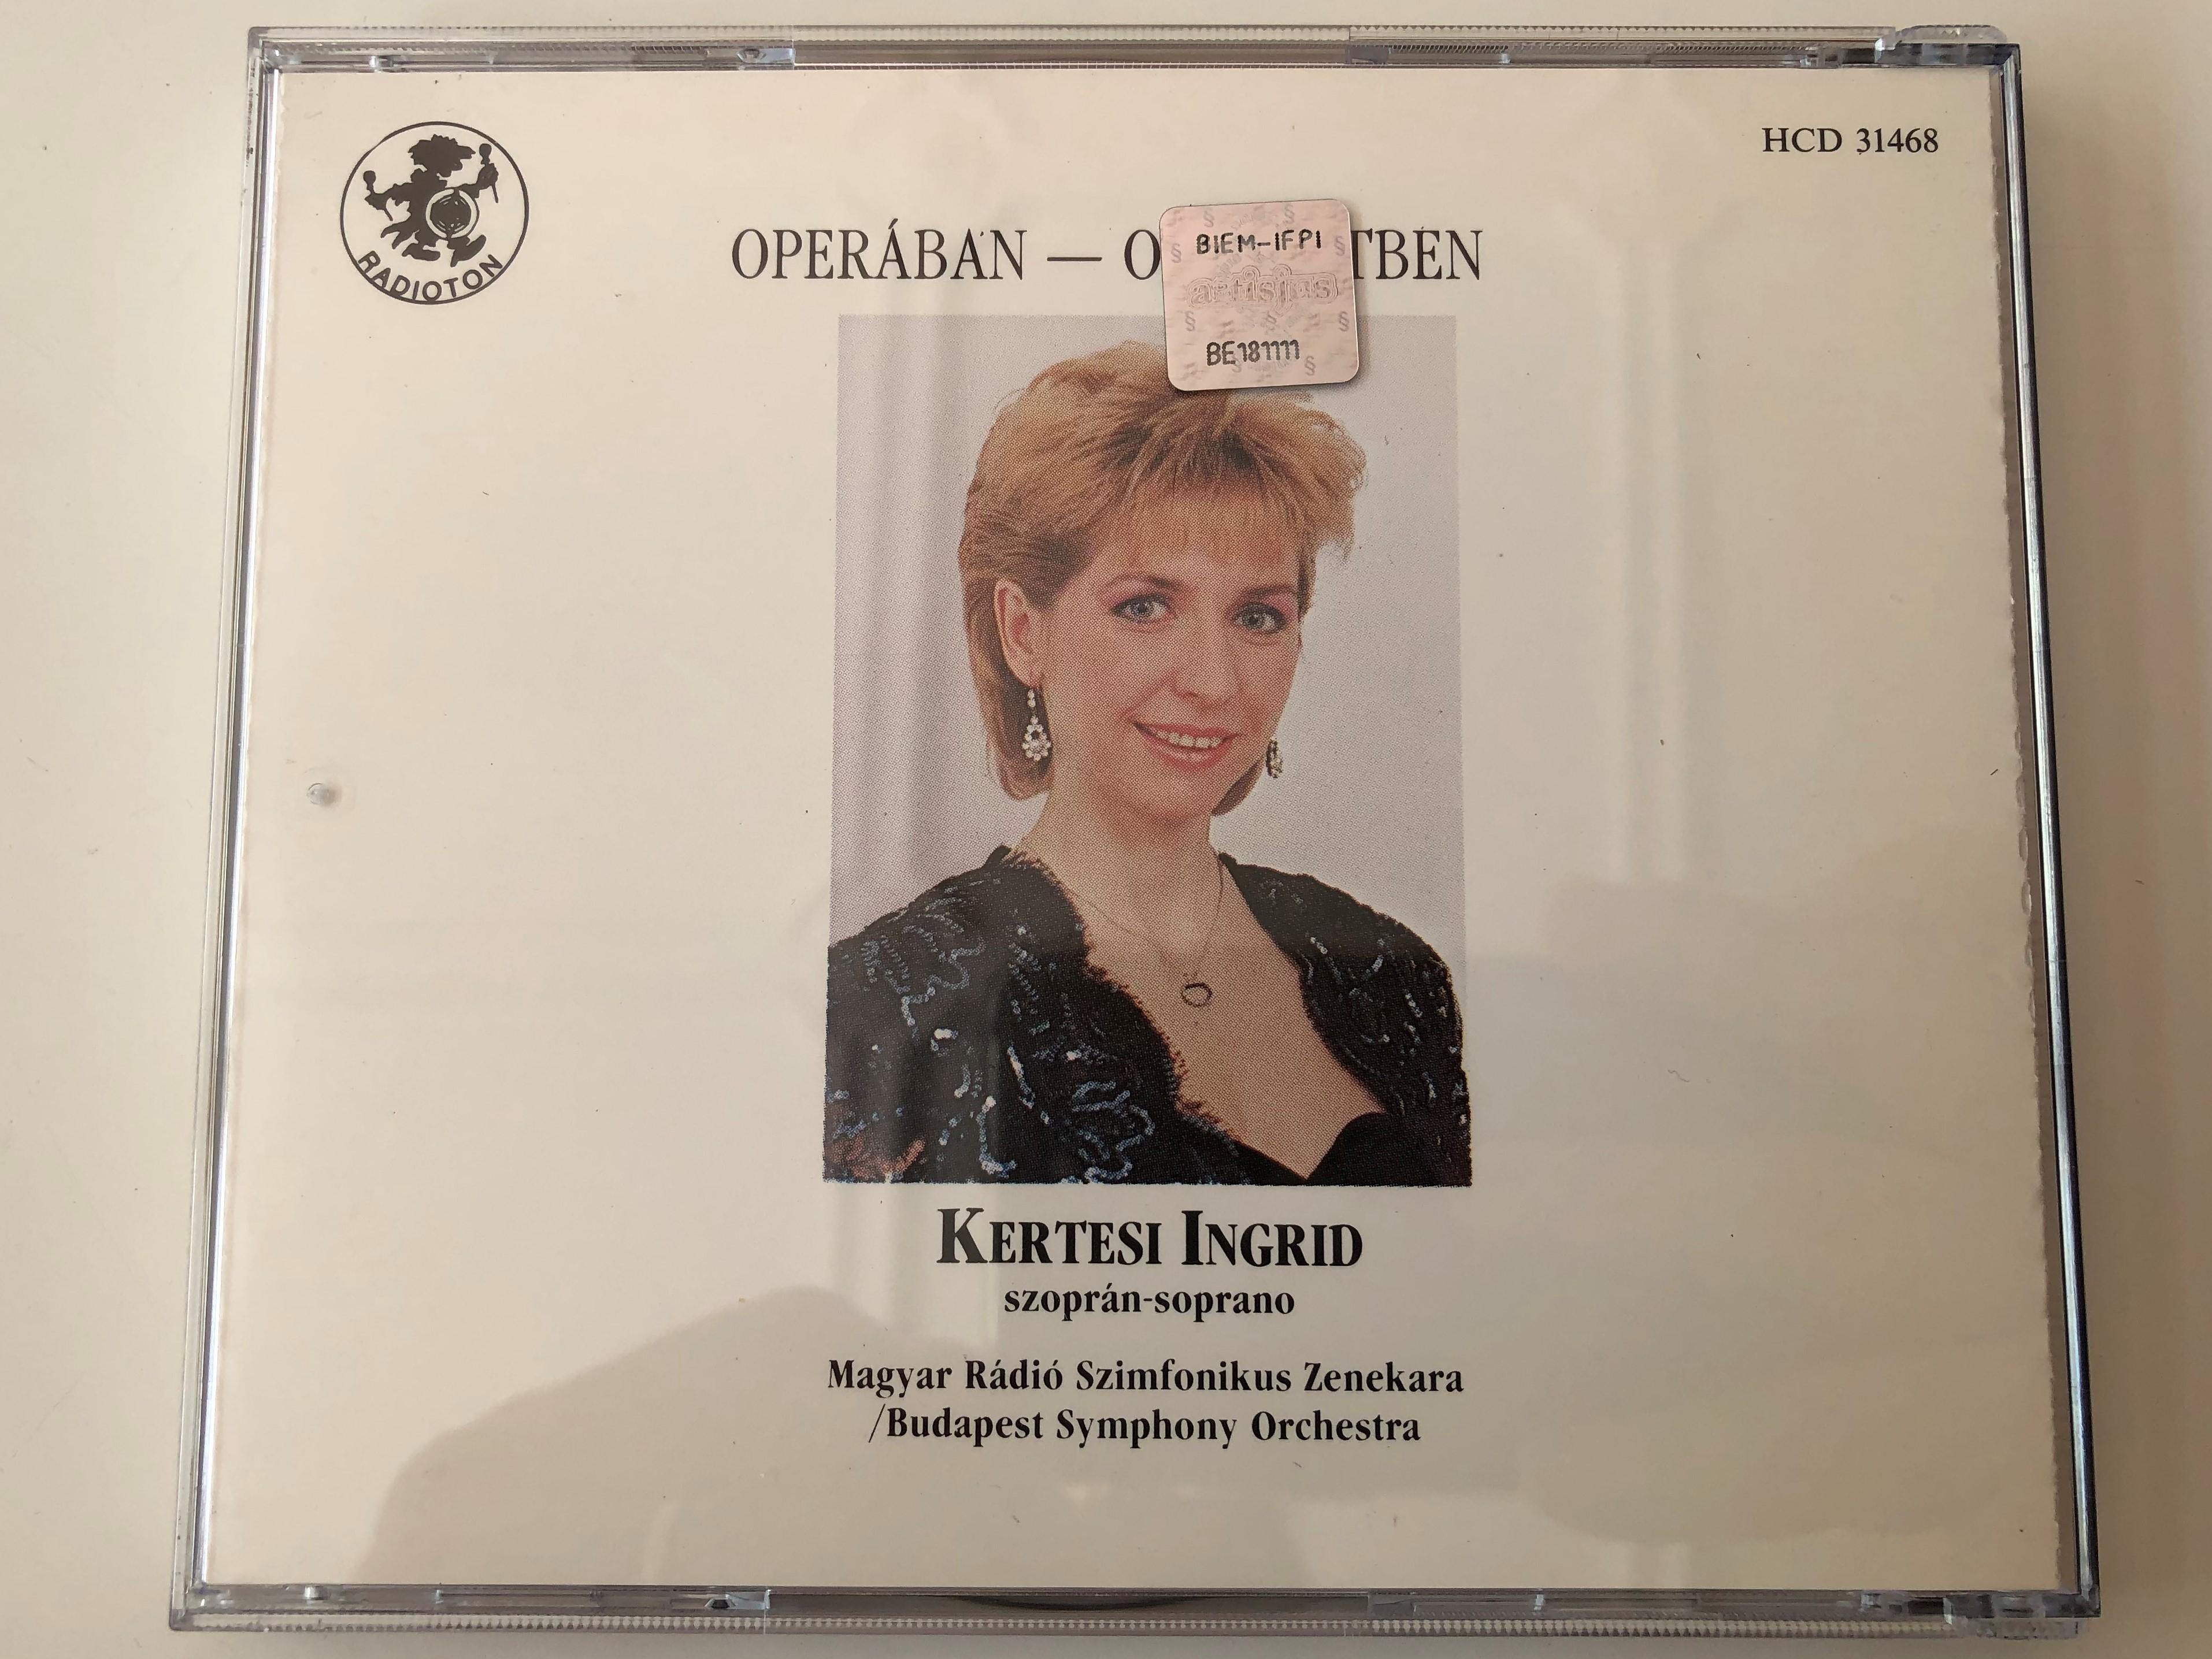 kertesi-ingrid-oper-ban-operettben-magyar-r-di-szimf-nikus-zenekara-budapest-symphony-orchestra-radioton-audio-cd-1991-stereo-hcd-31468-5-.jpg